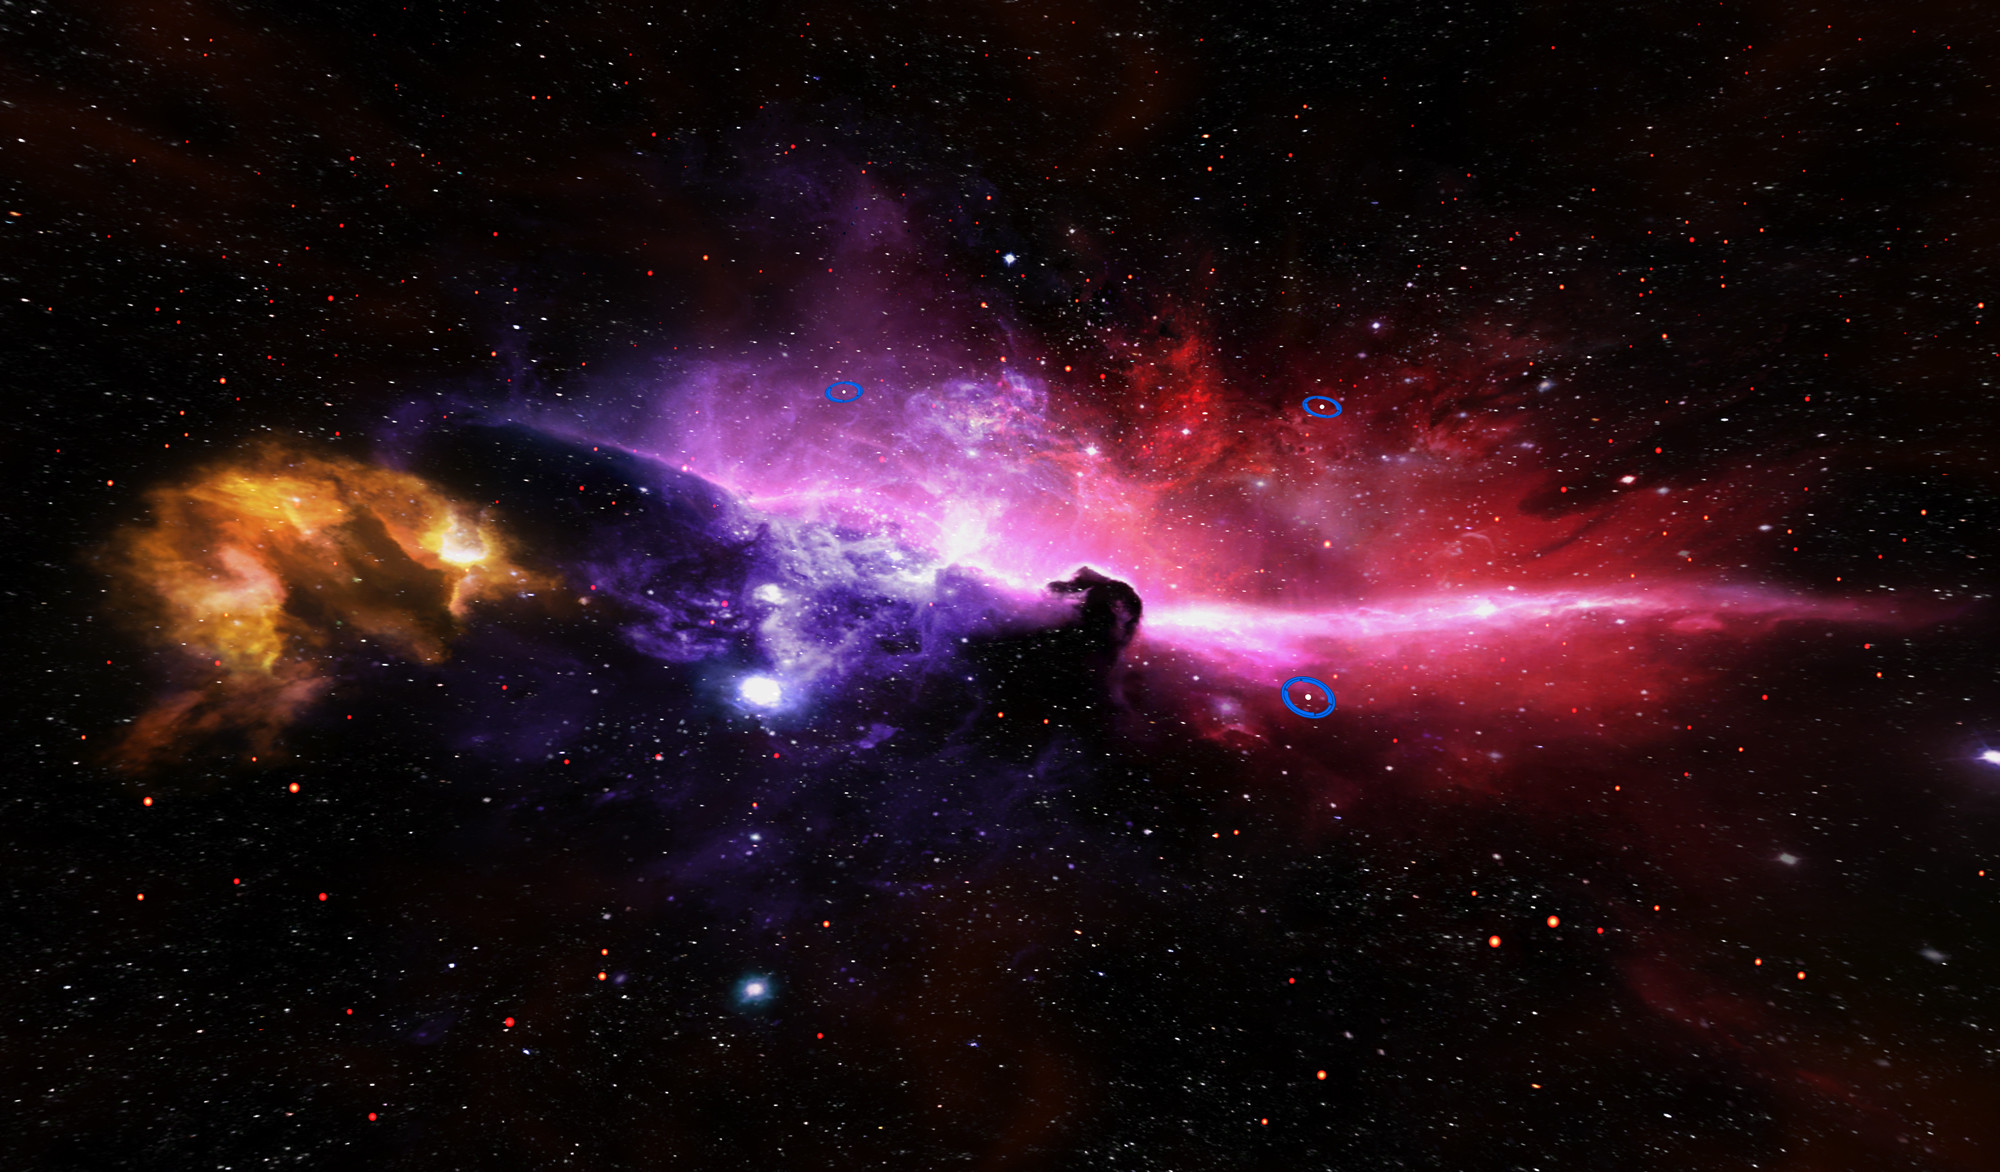 Nebula desktop wallpaper 67 images - Nebula wallpaper hd ...